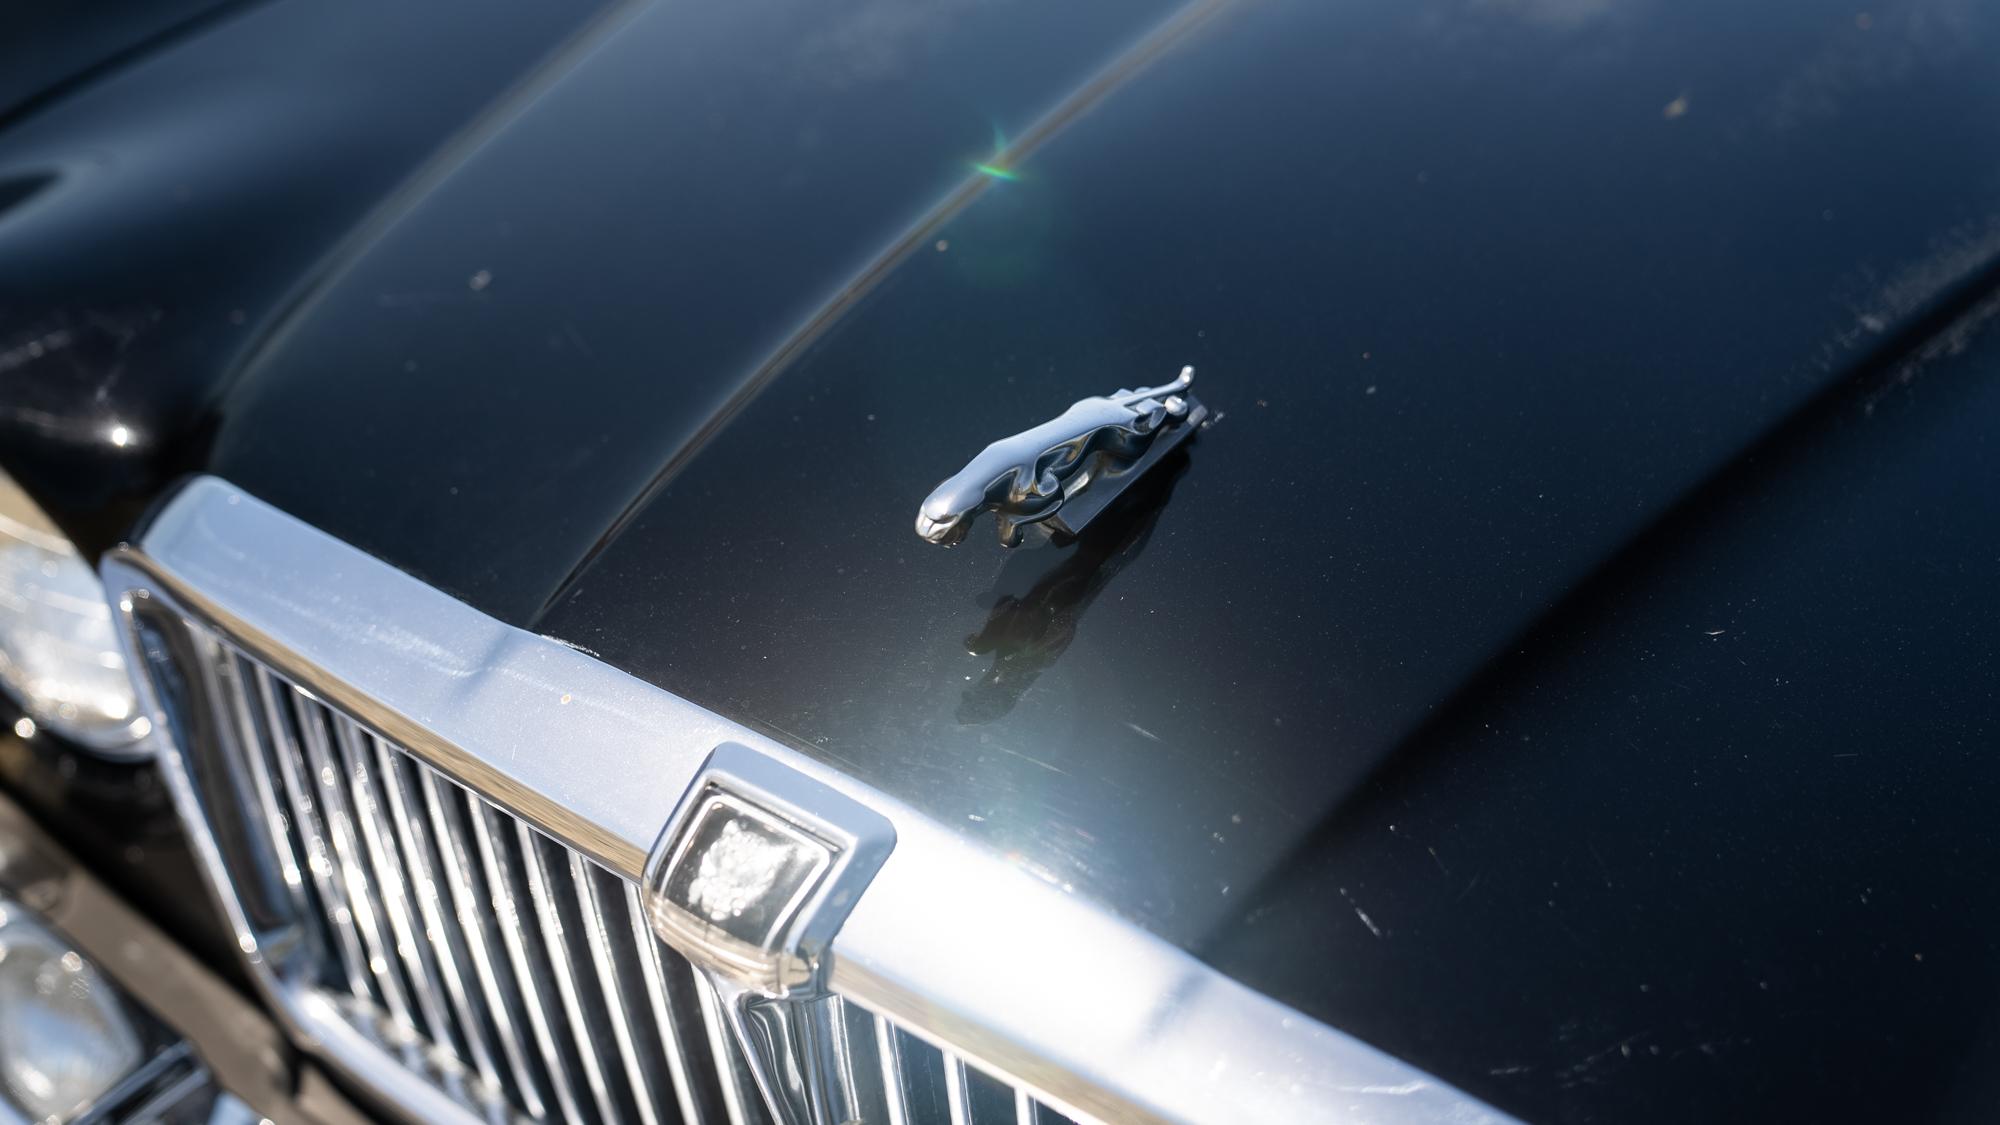 1986 Jaguar XJ6 leaper